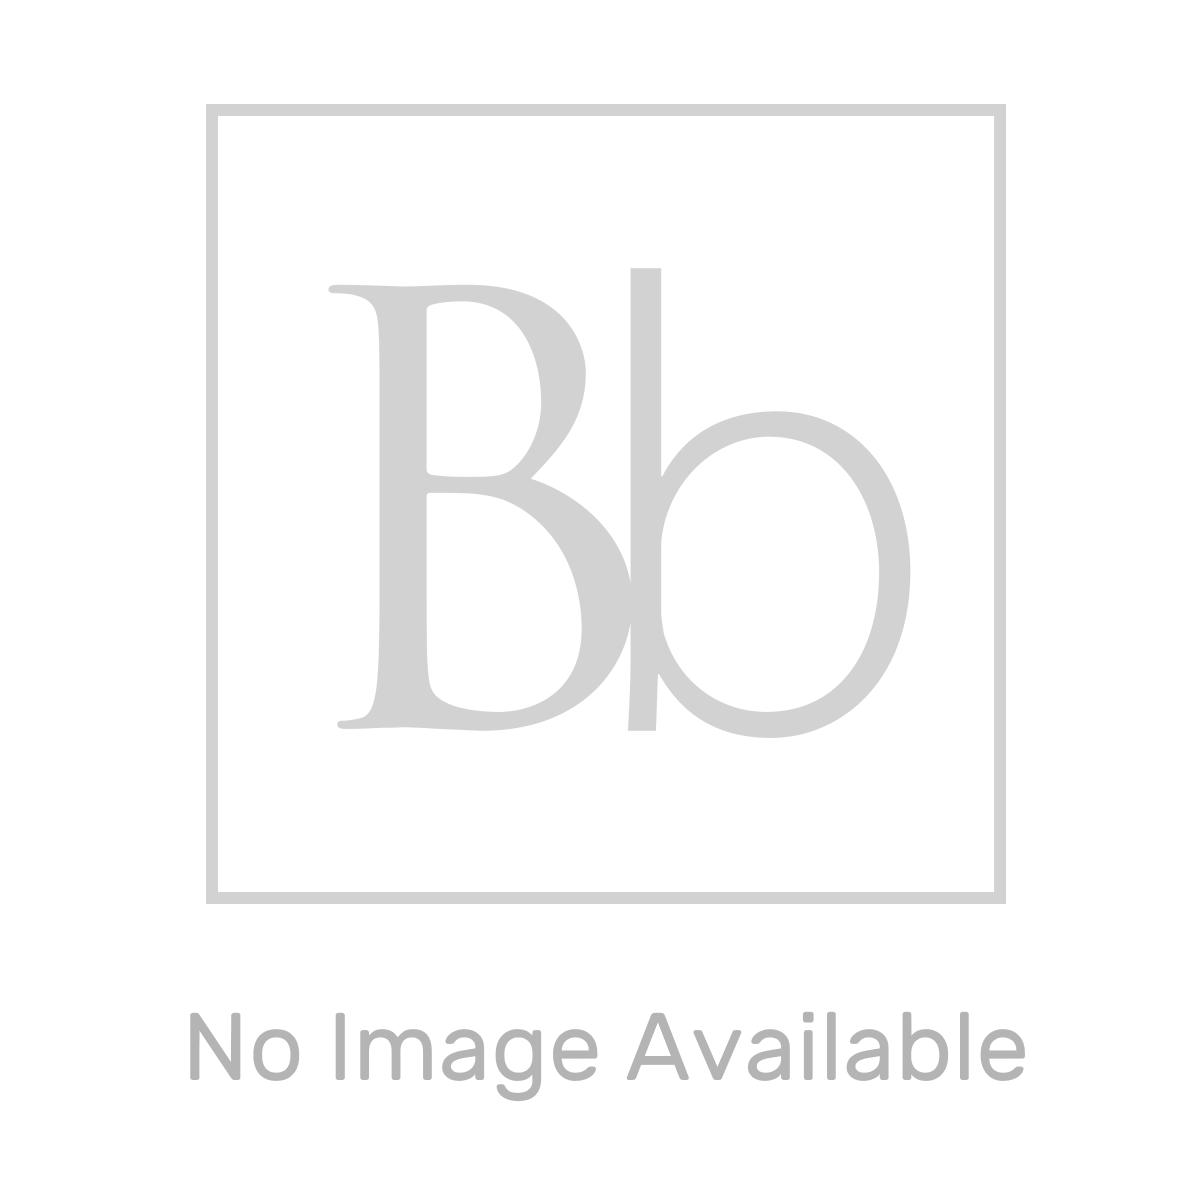 Click clack basin waste ek303 measurements